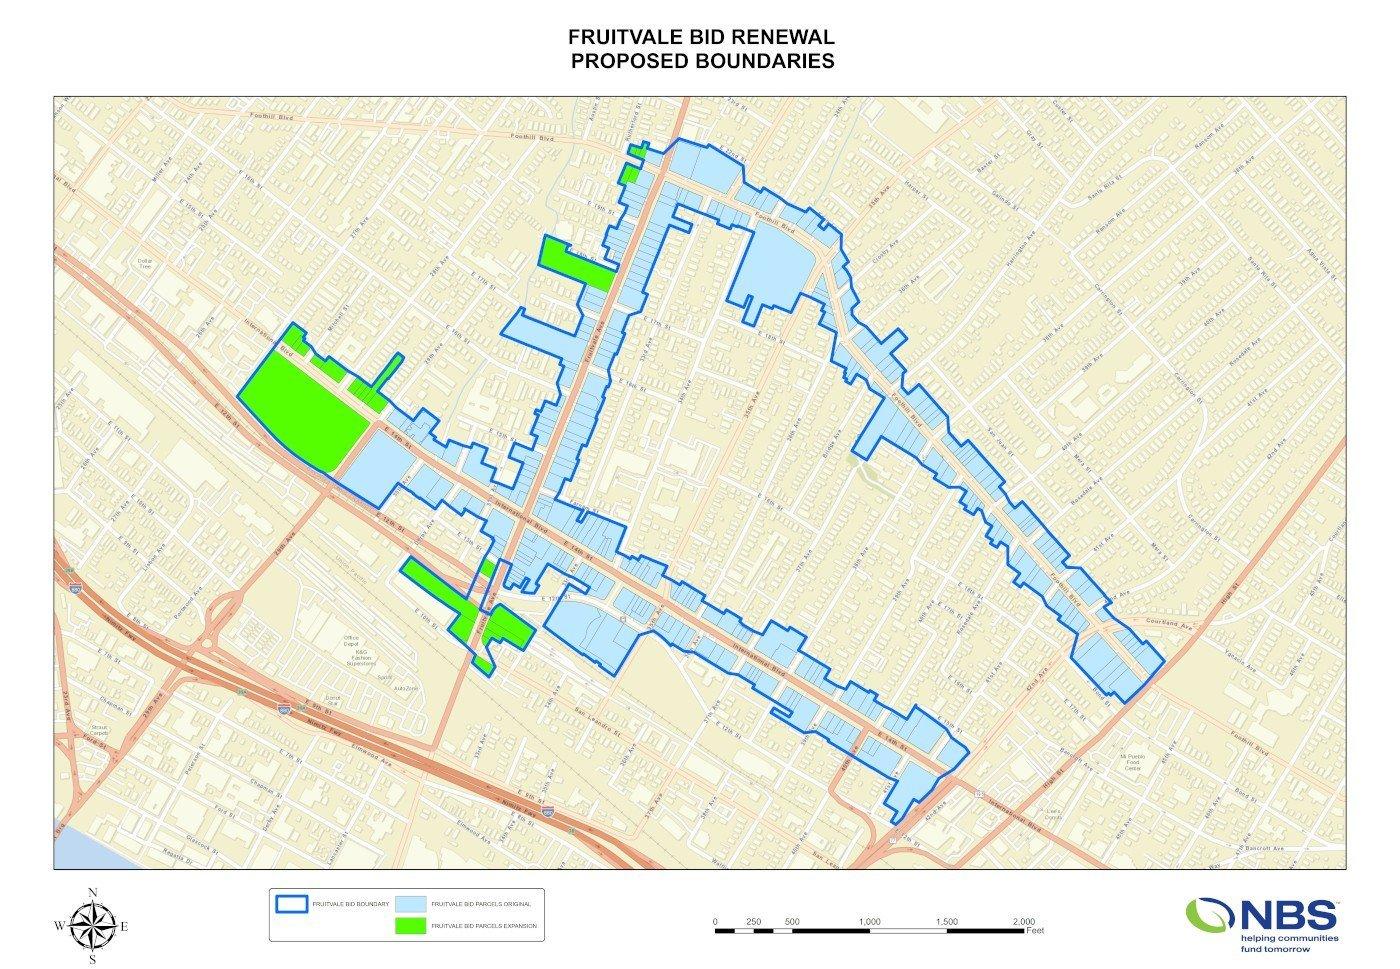 Fruitvale BID Proposed Boundary 3-18-2021